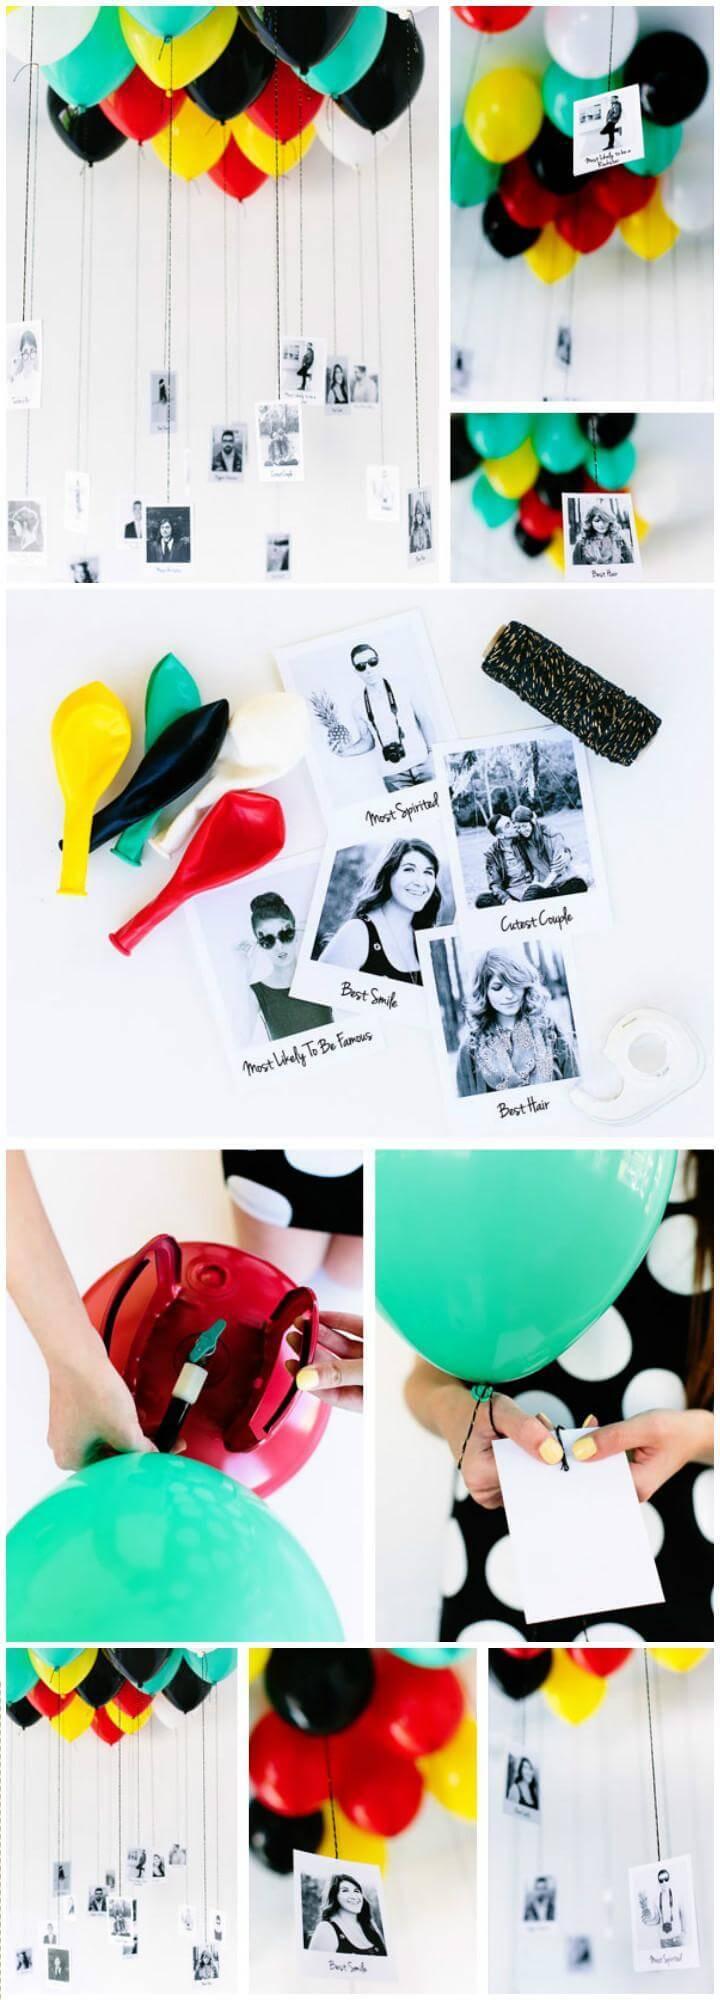 DIY Graduation Party Balloons Superlatives